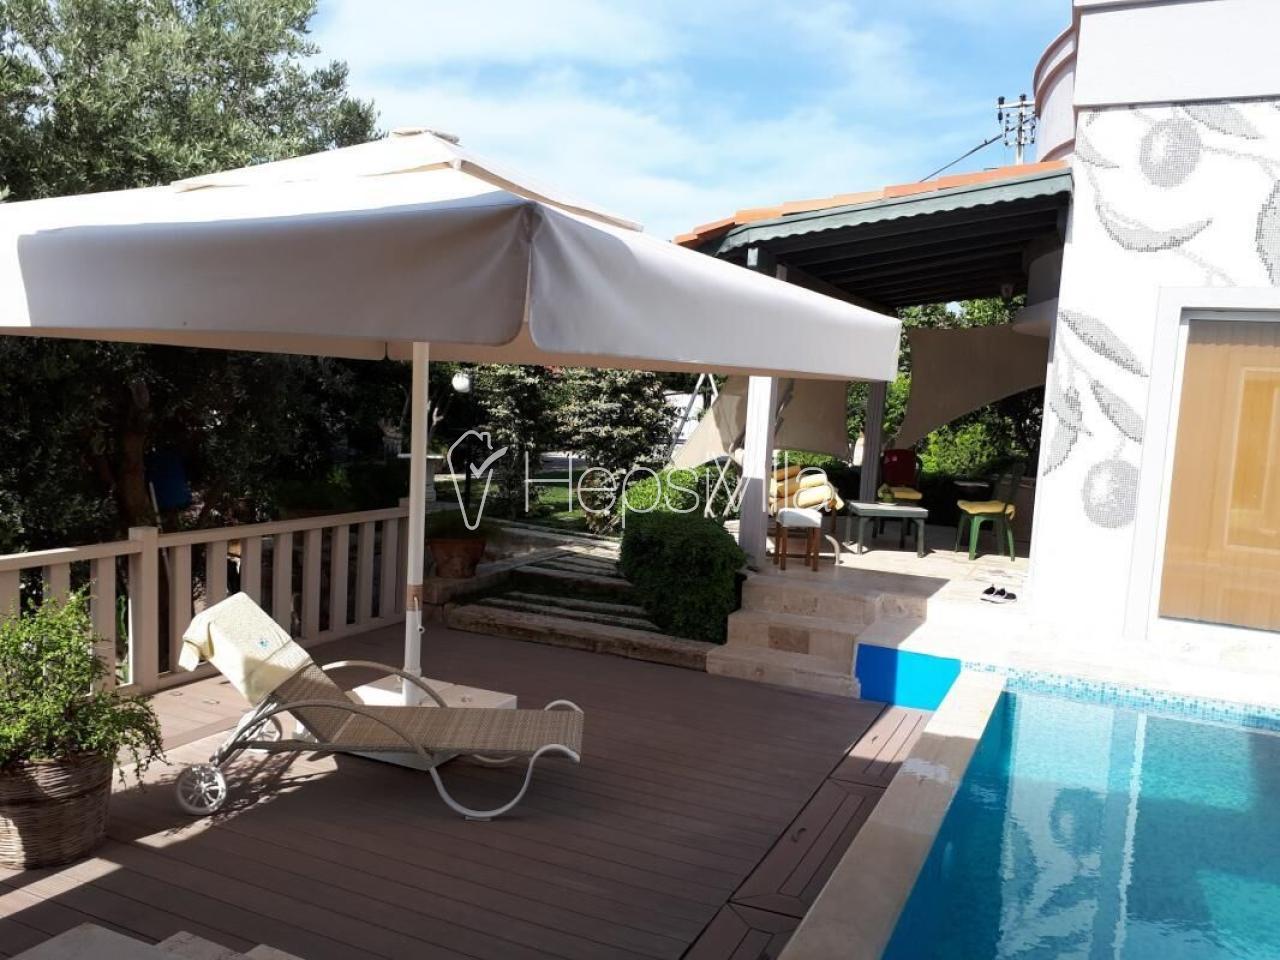 Villa Valley, Bodrum Yalıkavak'ta 6 Kişilik Müstakil Villa - Hepsi Villa